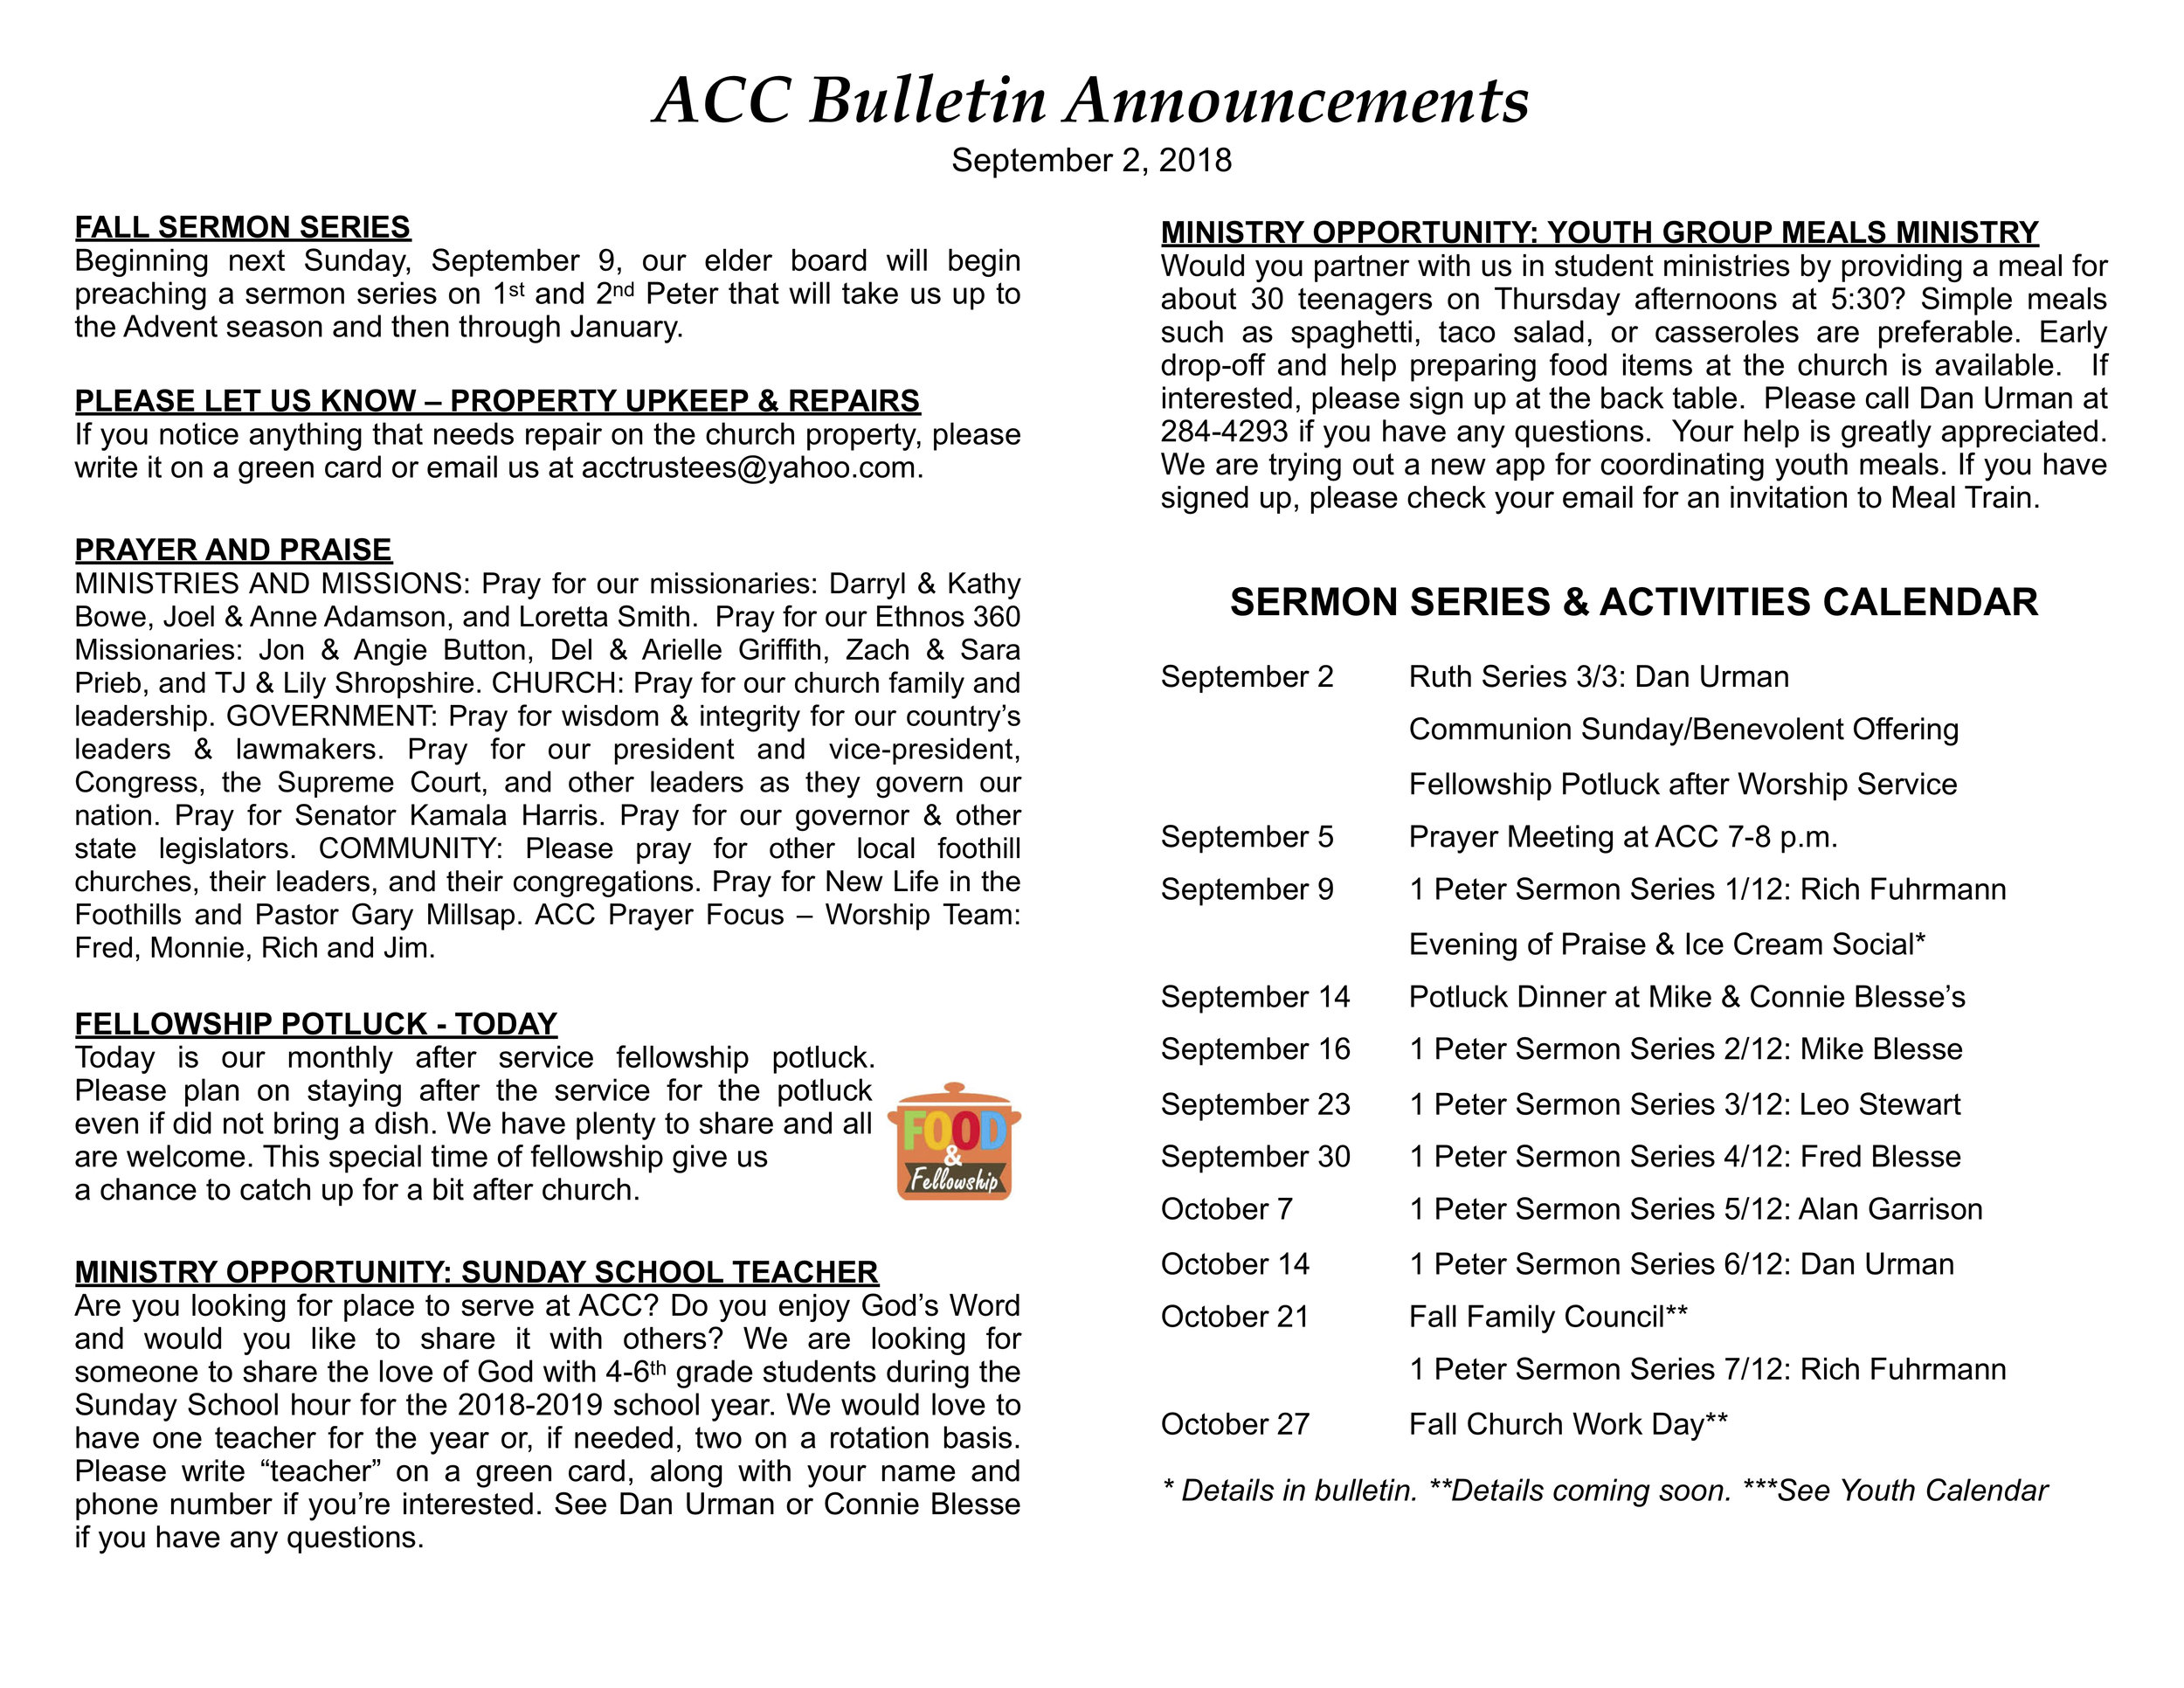 ACCBltn 2018.09.02-1.jpg